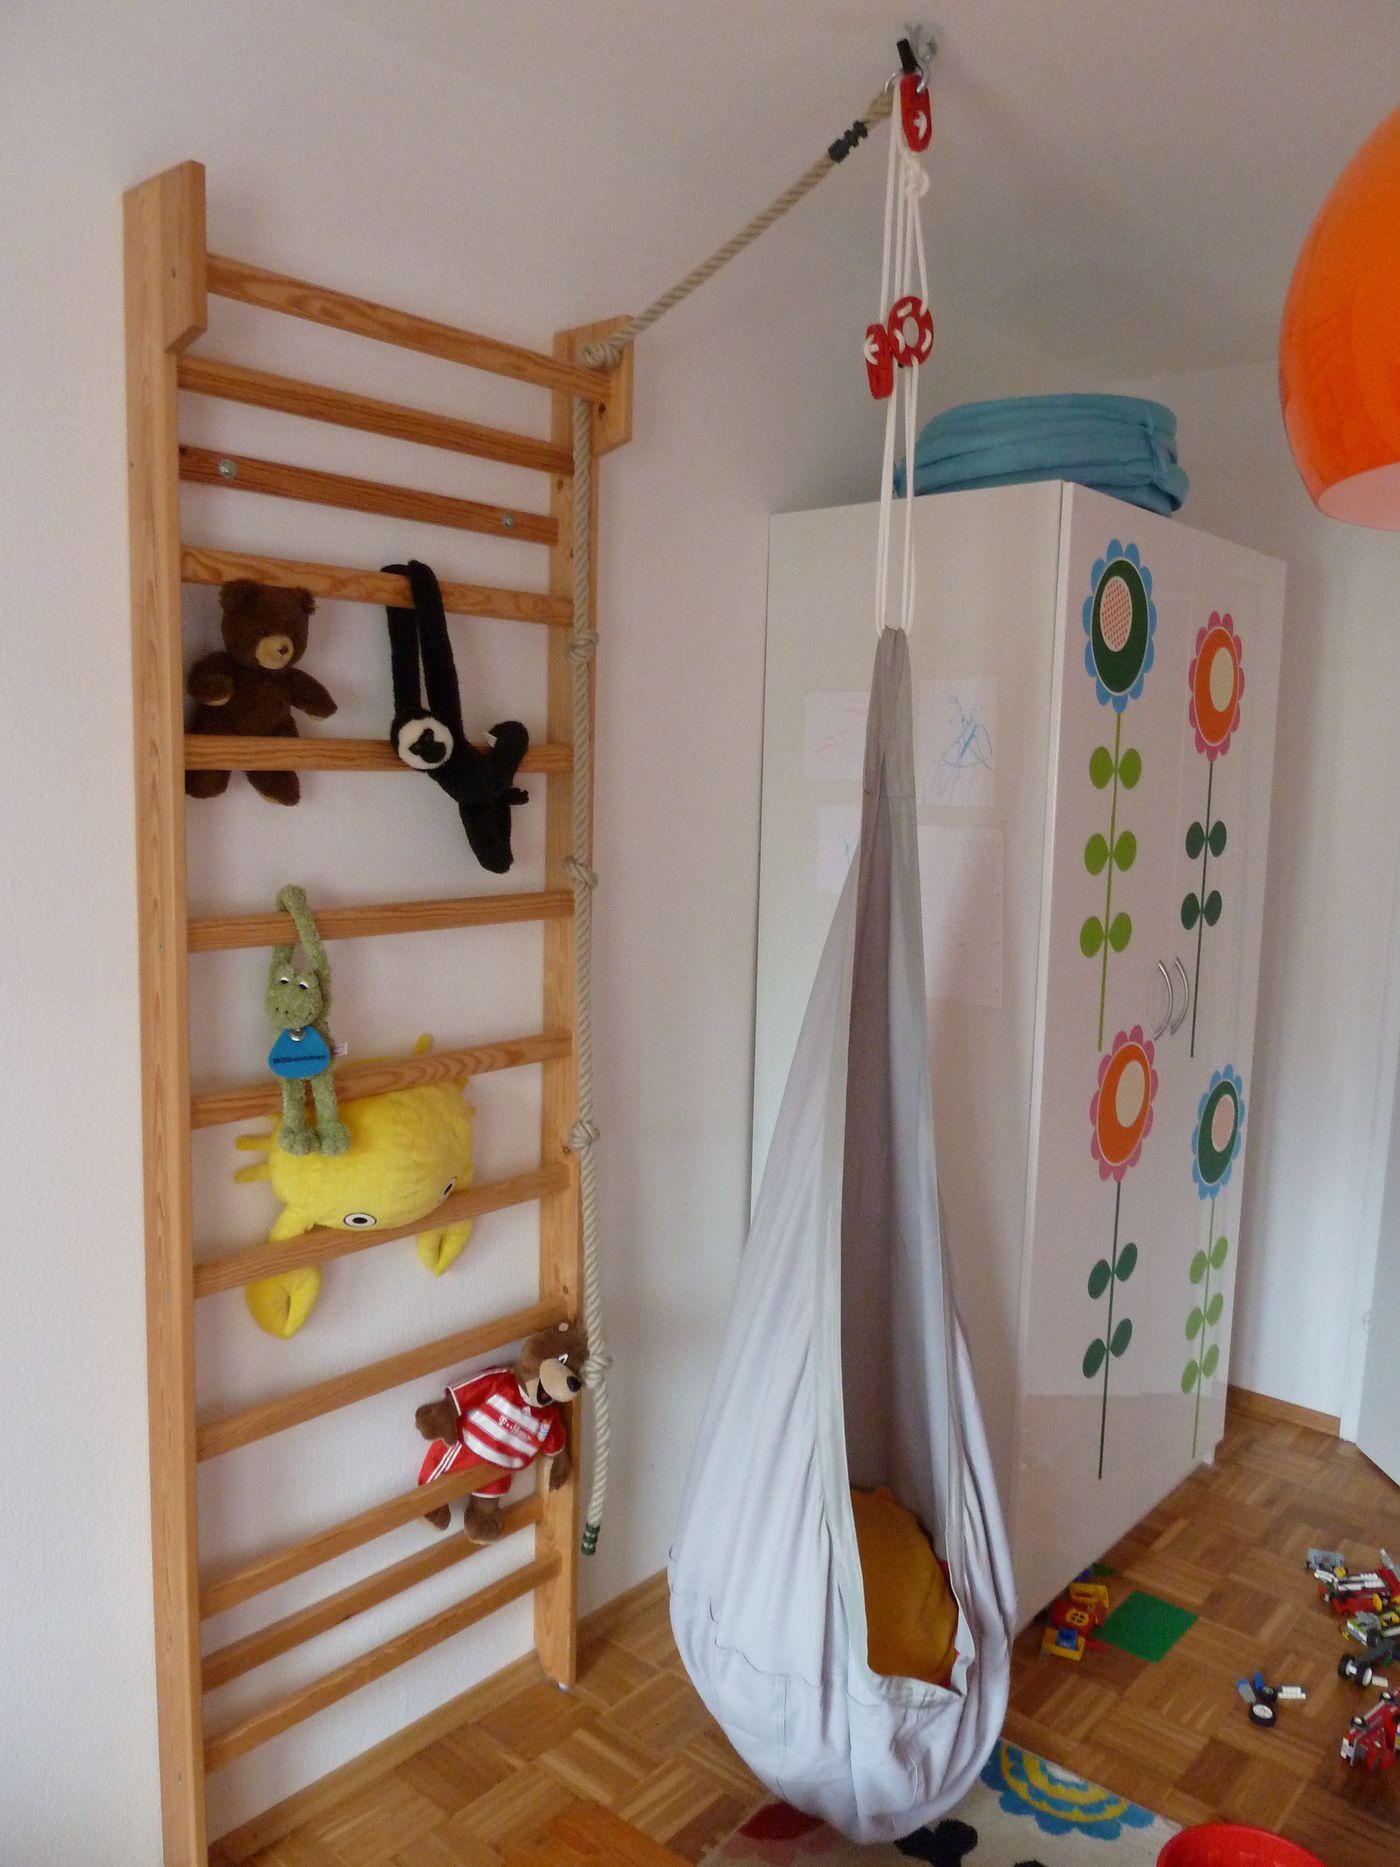 Full Size of Regal Kinderzimmer Weiß Regale Hängesessel Garten Sofa Kinderzimmer Hängesessel Kinderzimmer